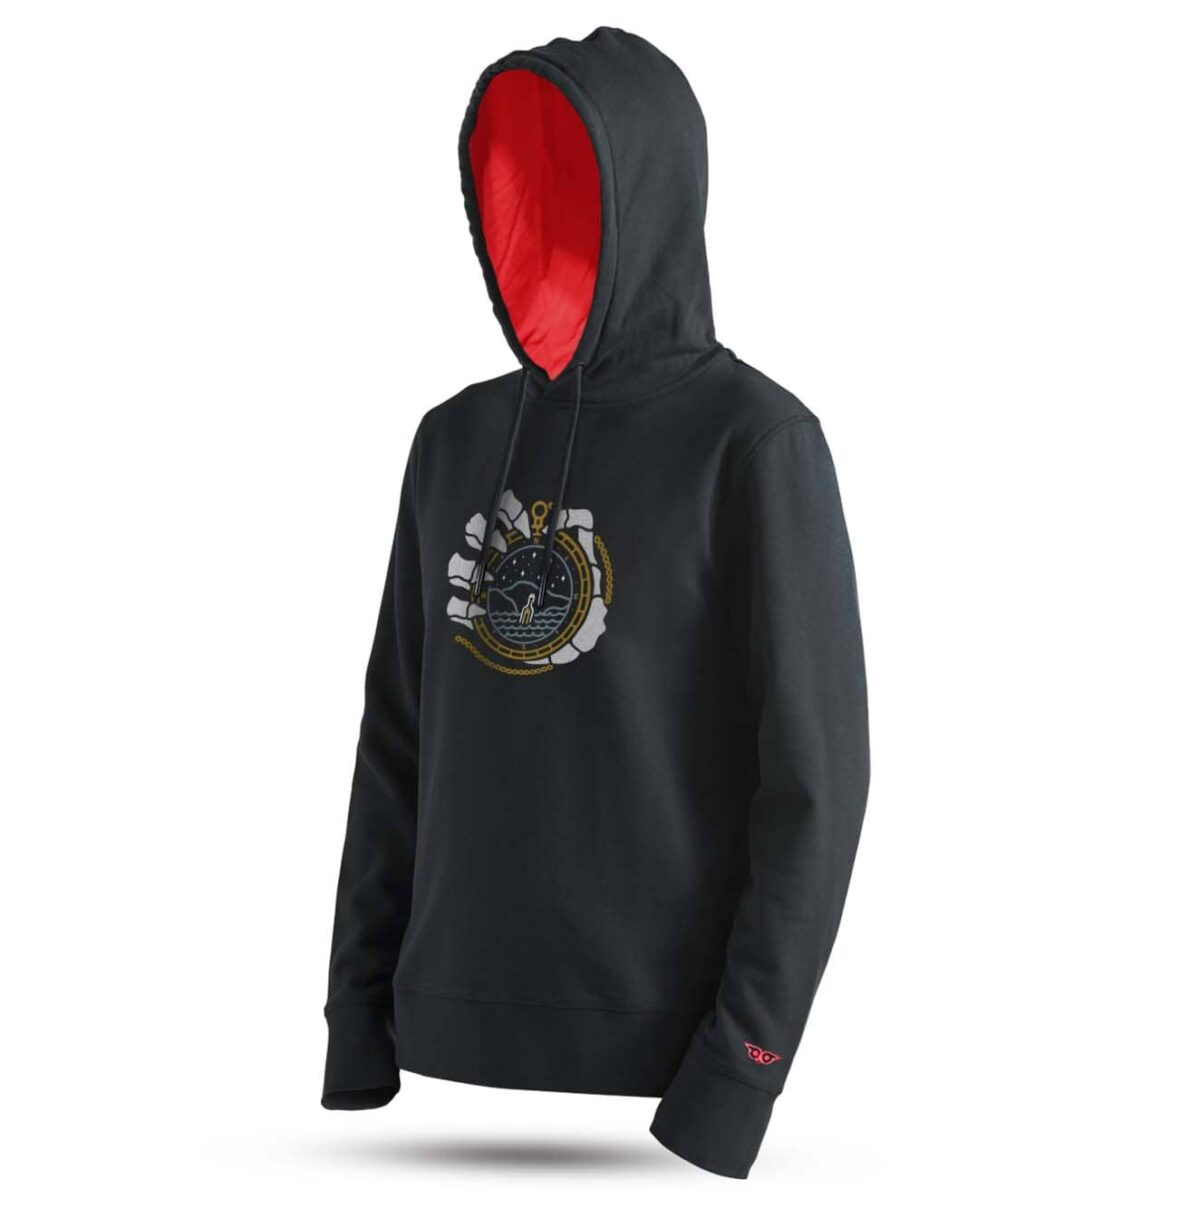 tarrzz-tasarim-kapsonlu-sweatshirt-pusula-baskili-sweatshirt